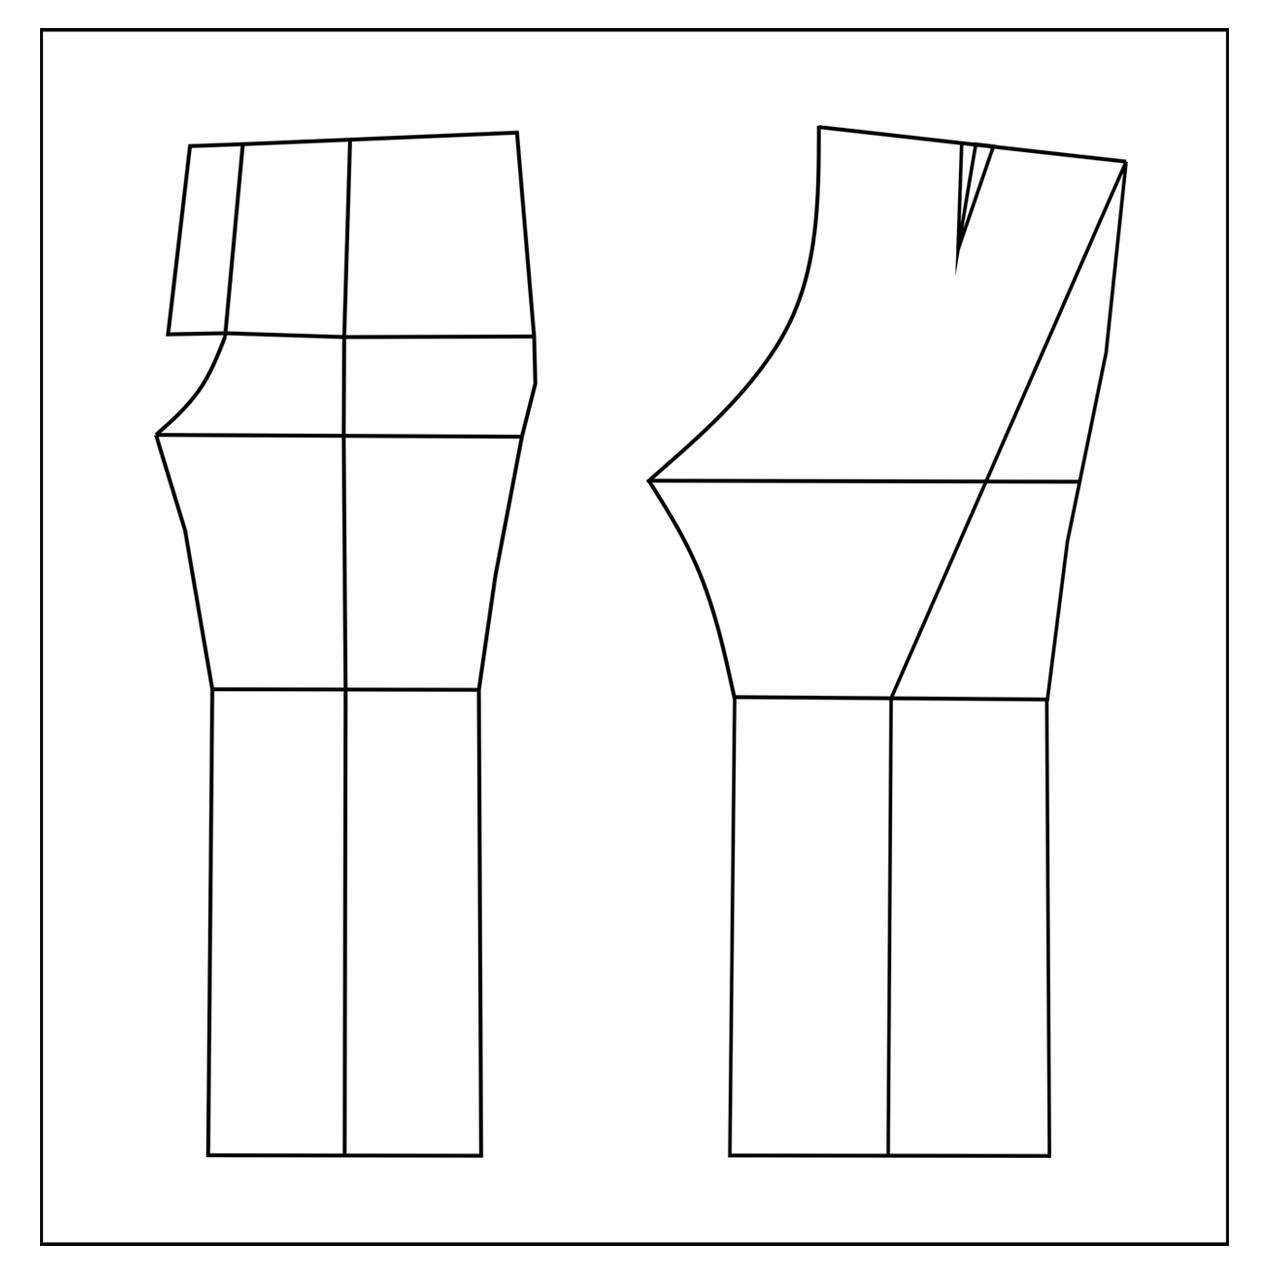 الگو خیاطی شلوار زنانه متد مولر سایز 42